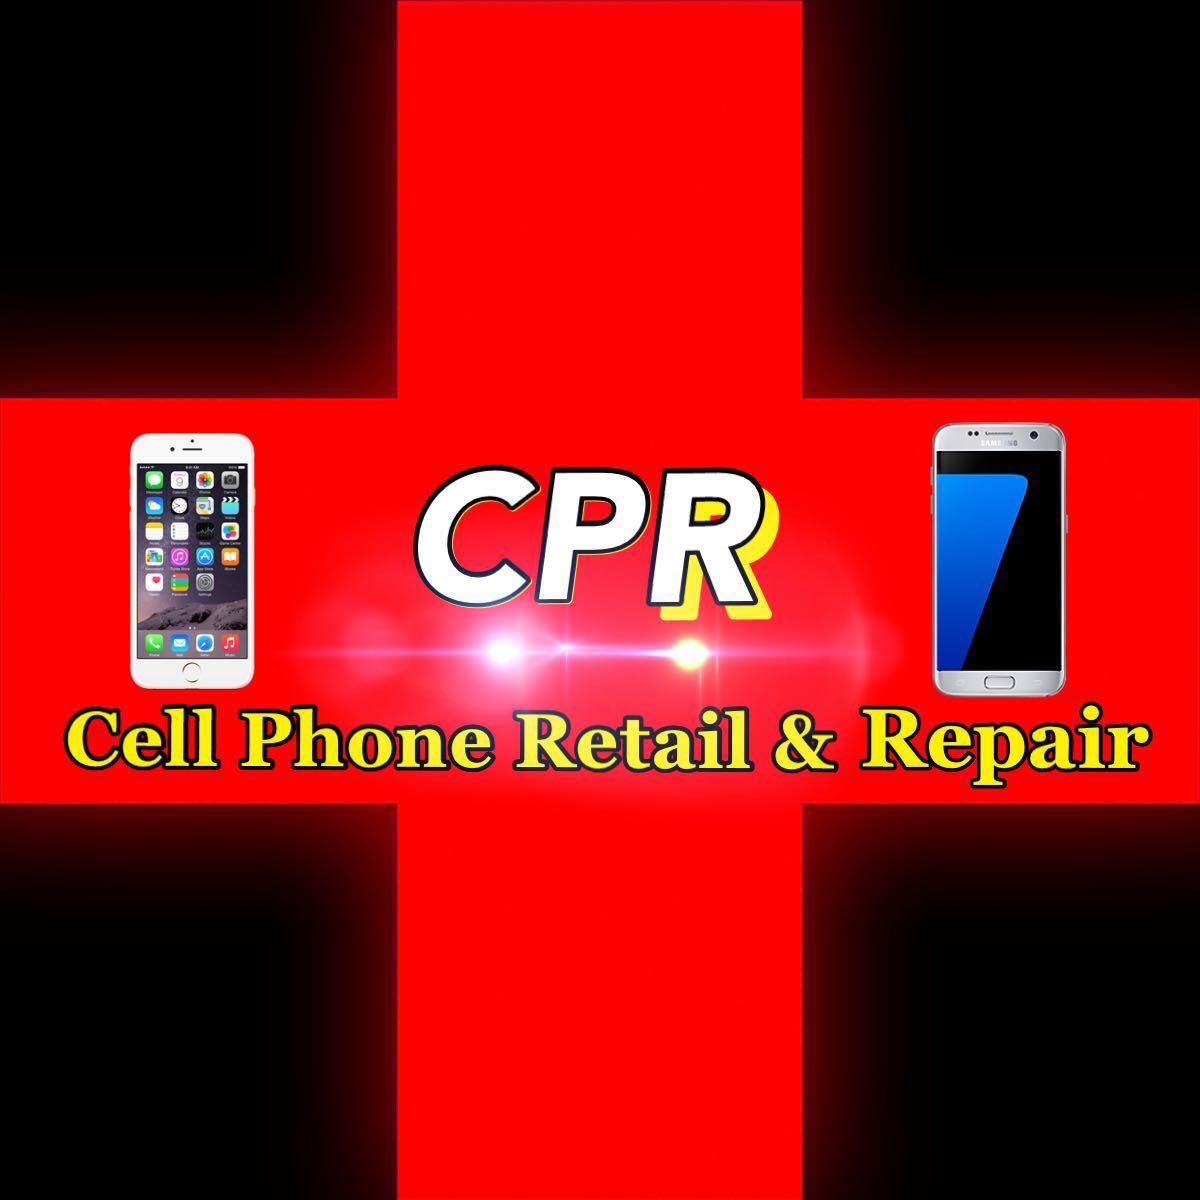 cellphoneretail